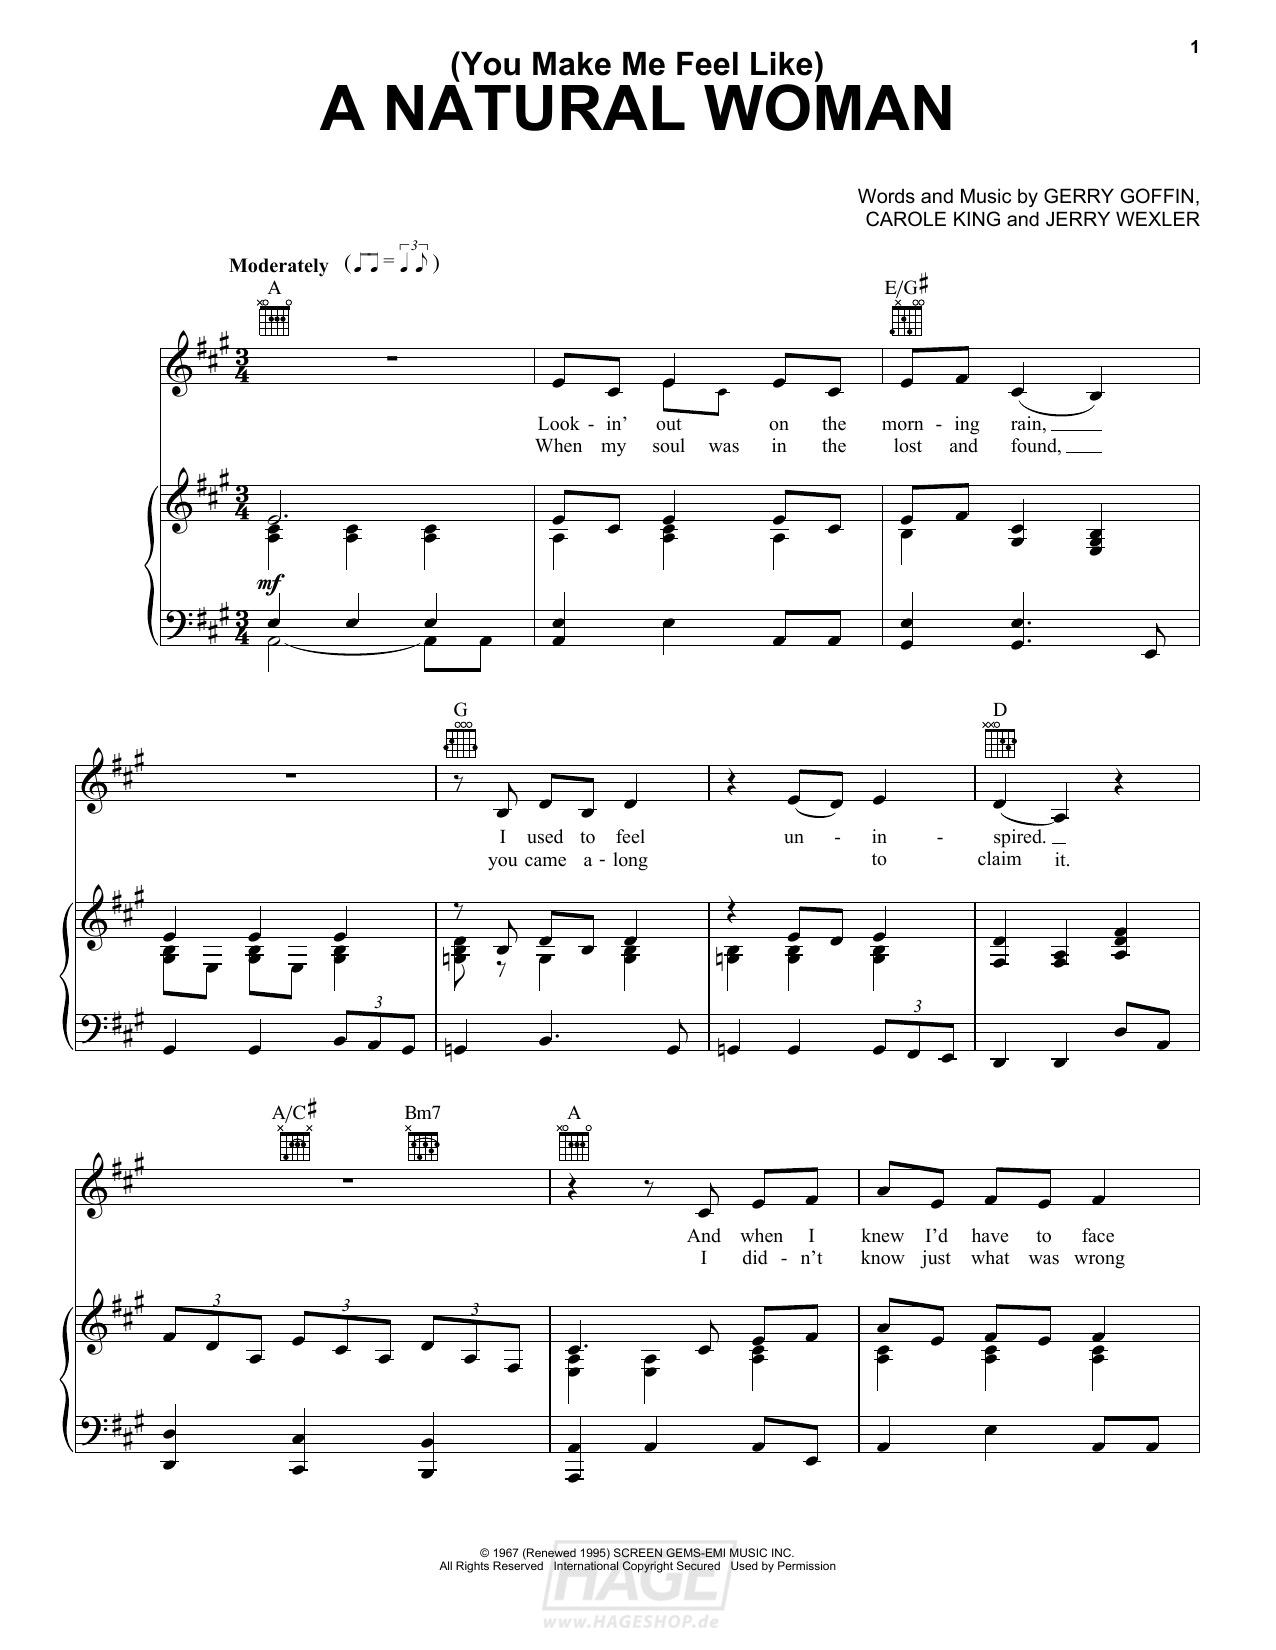 (You Make Me Feel Like) A Natural Woman - Aretha Franklin - Noten Druckvorschau